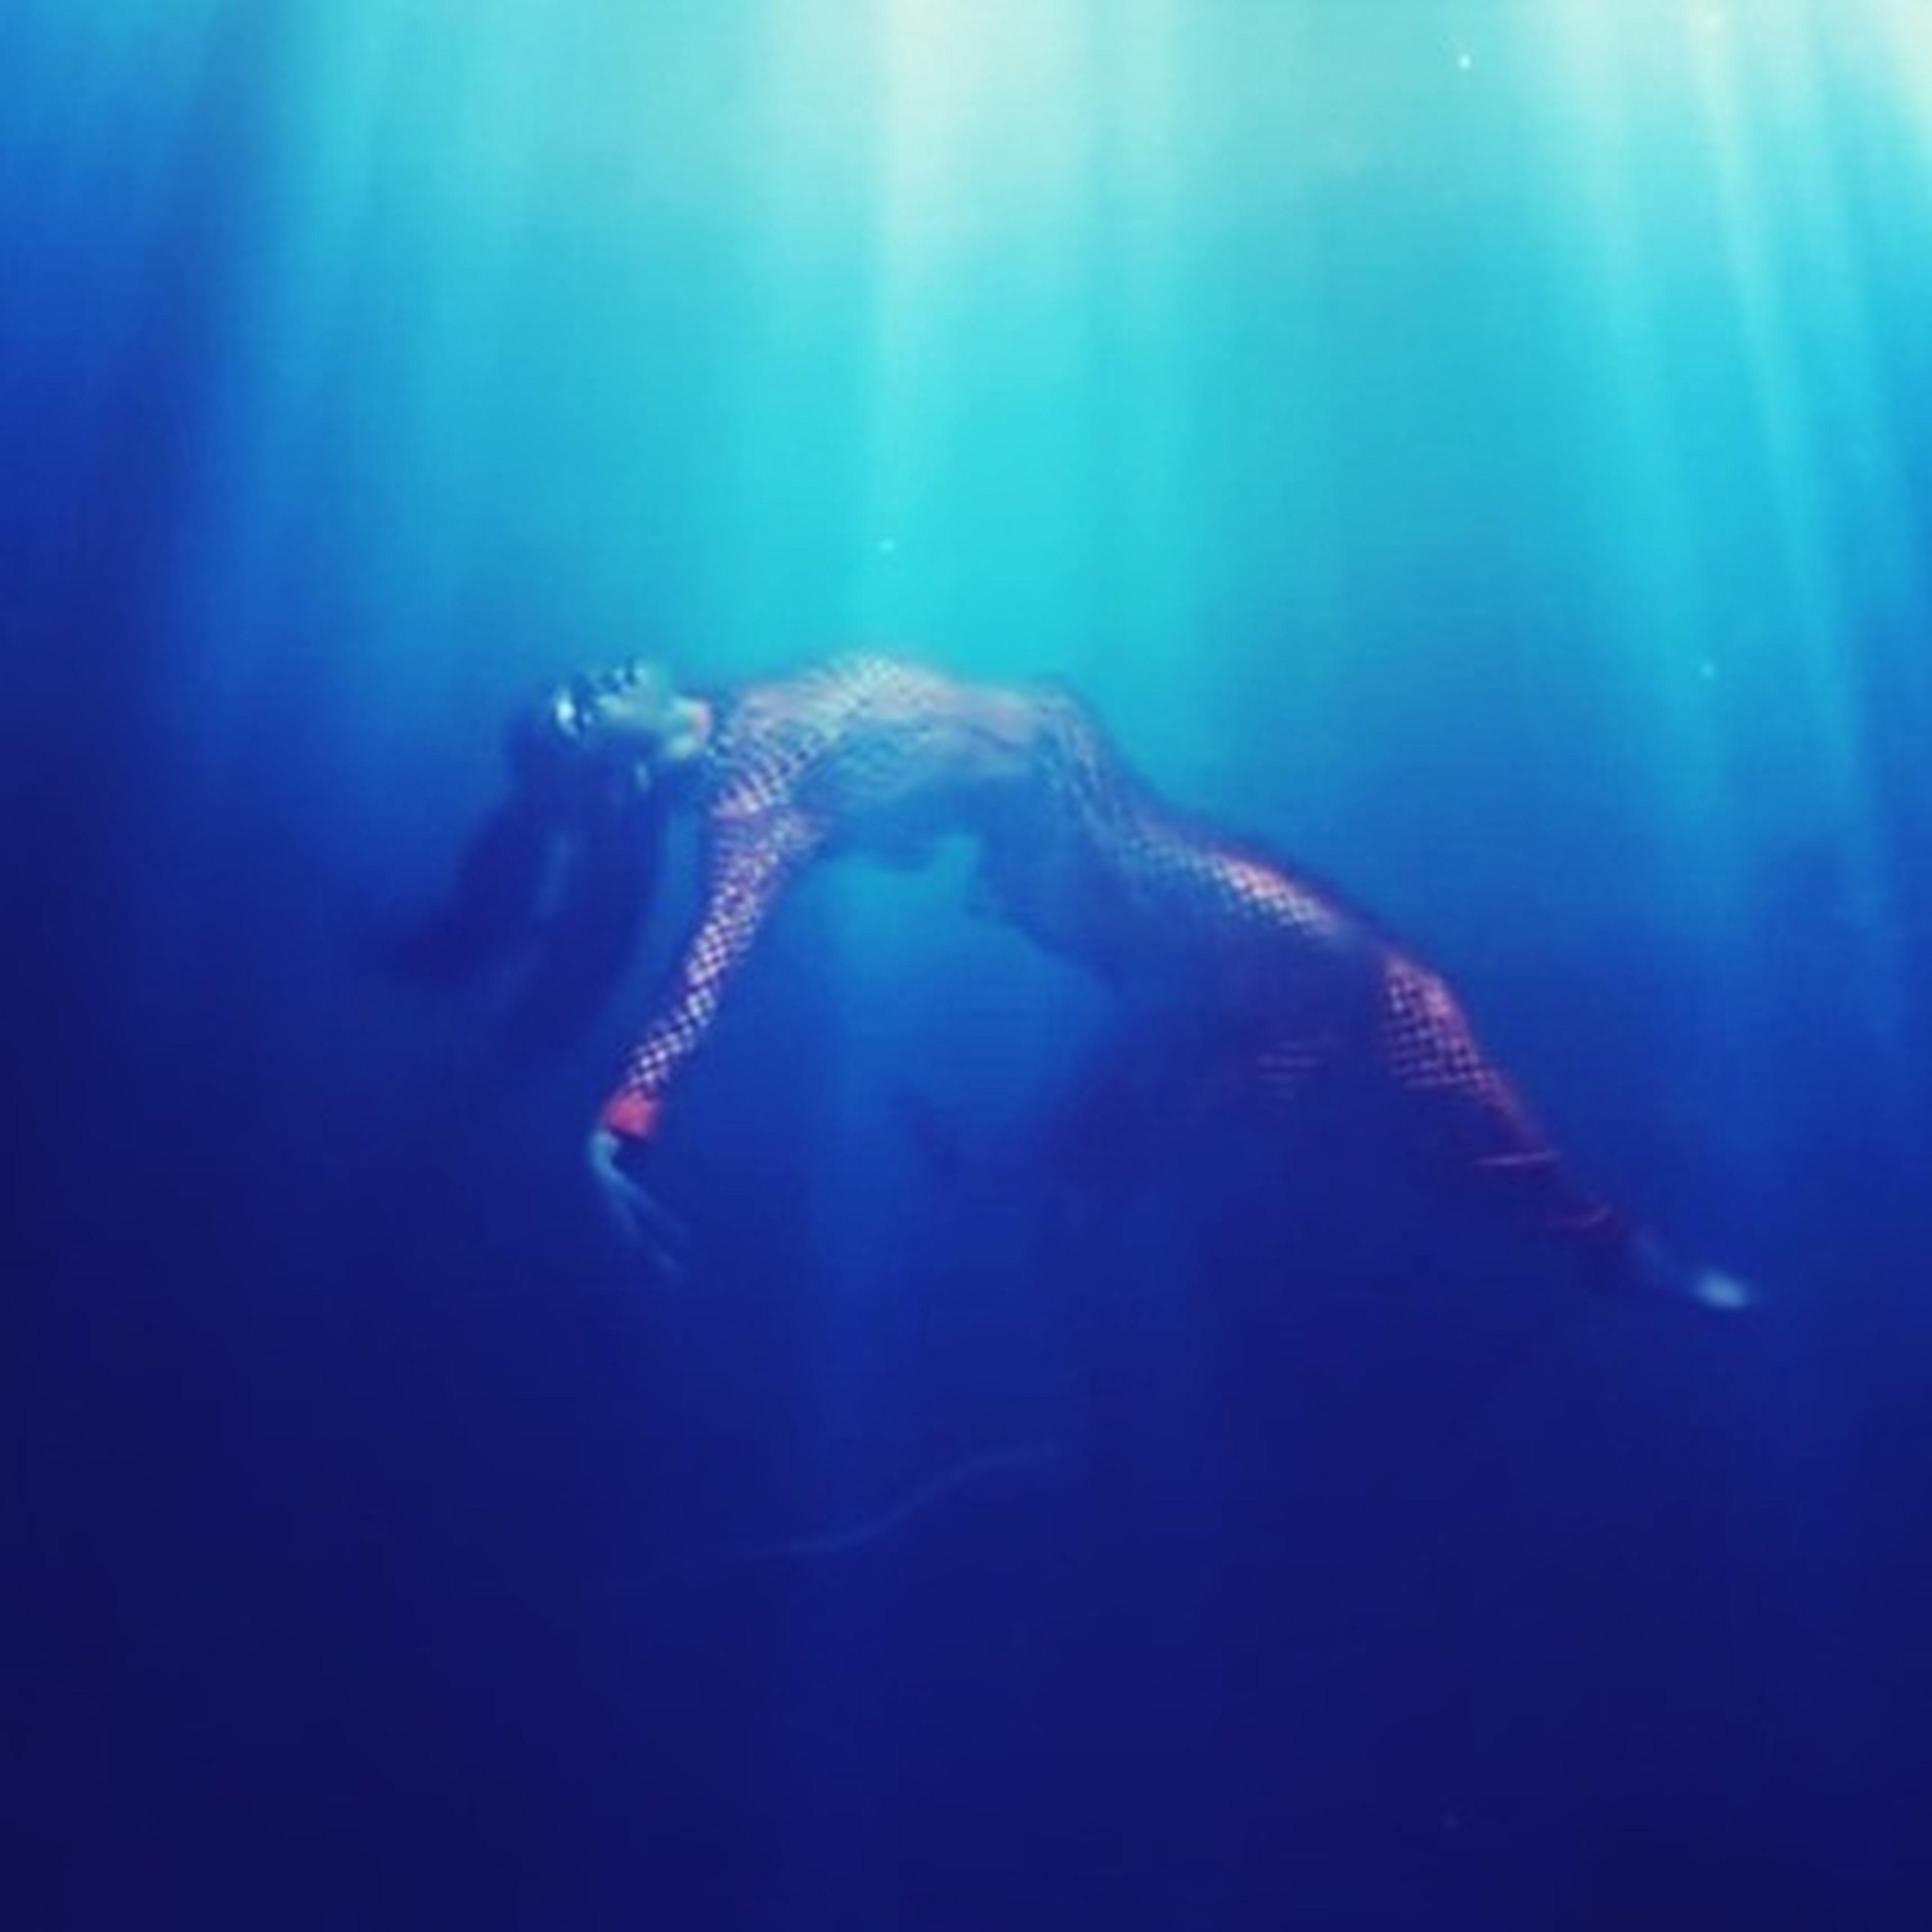 underwater, swimming, water, lifestyles, leisure activity, blue, sea, undersea, men, sea life, indoors, enjoyment, fish, aquarium, person, unrecognizable person, scuba diving, fun